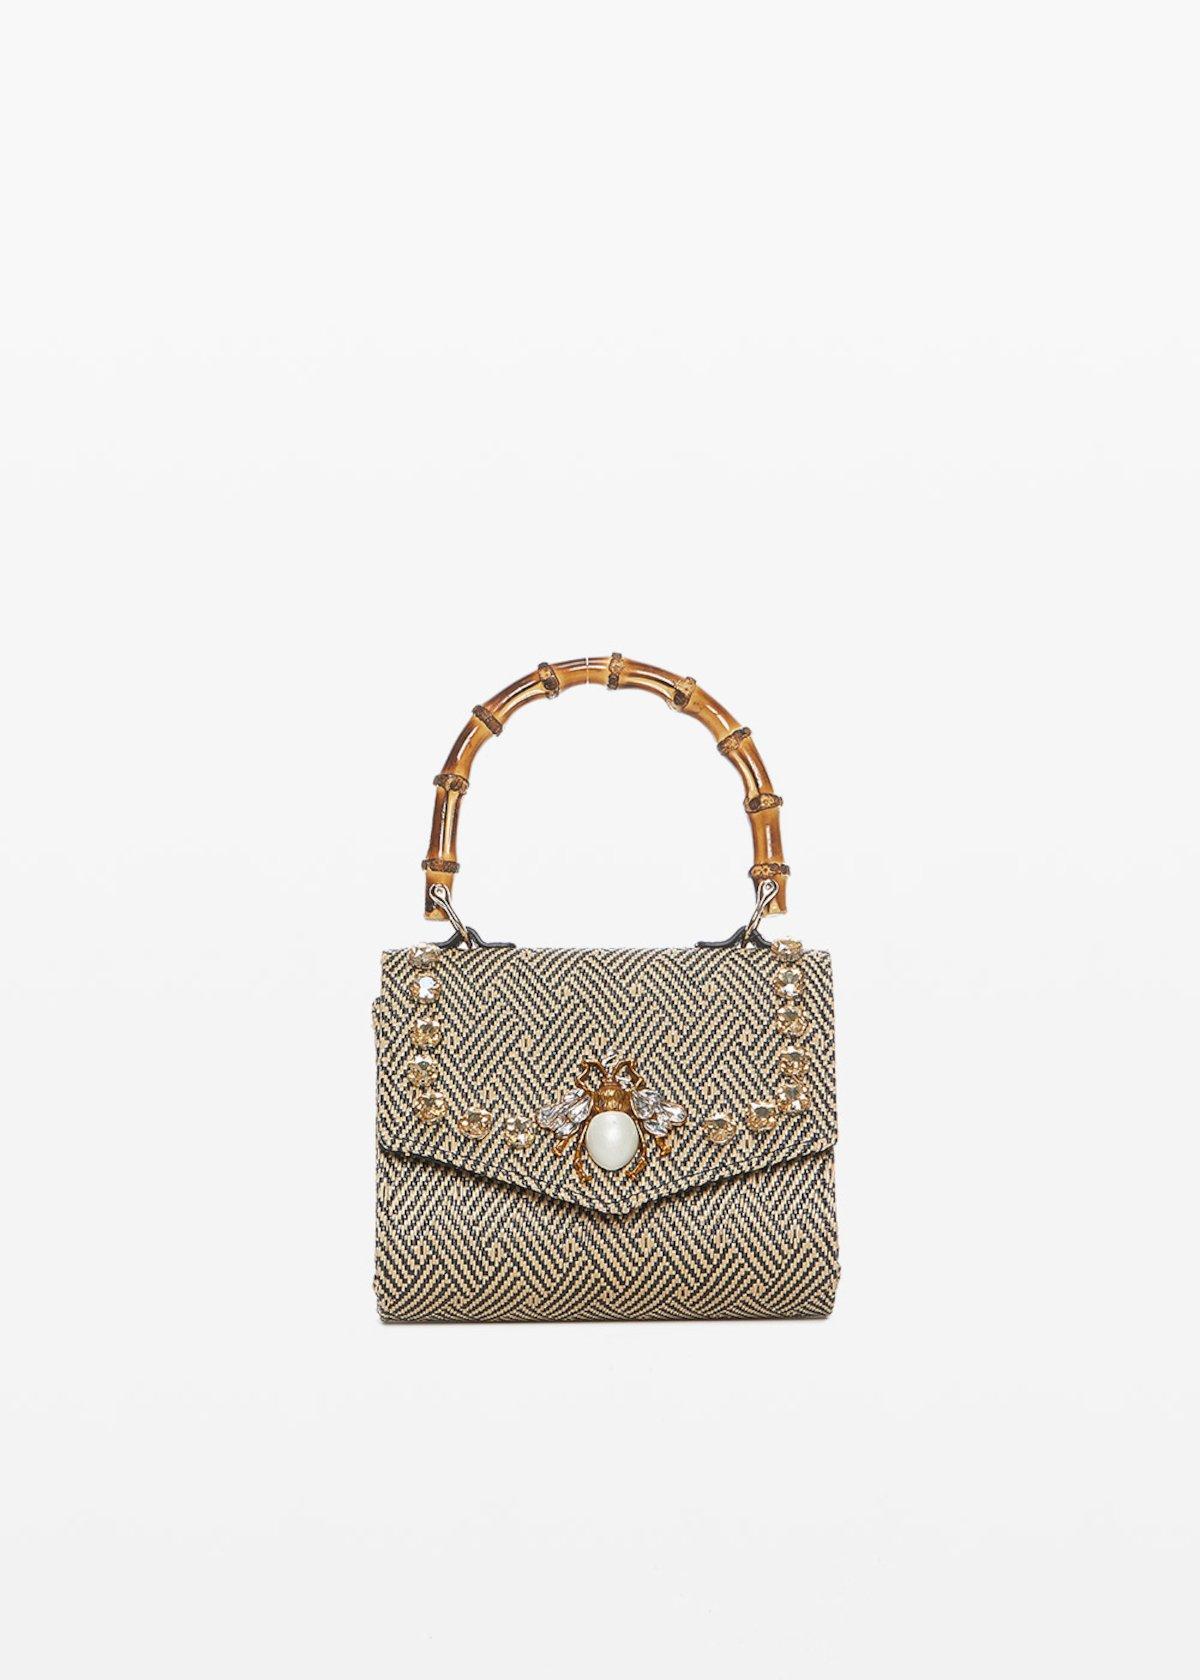 Clutch bag Braided in paglia intrecciata - Nomad / Black - Donna - Immagine categoria